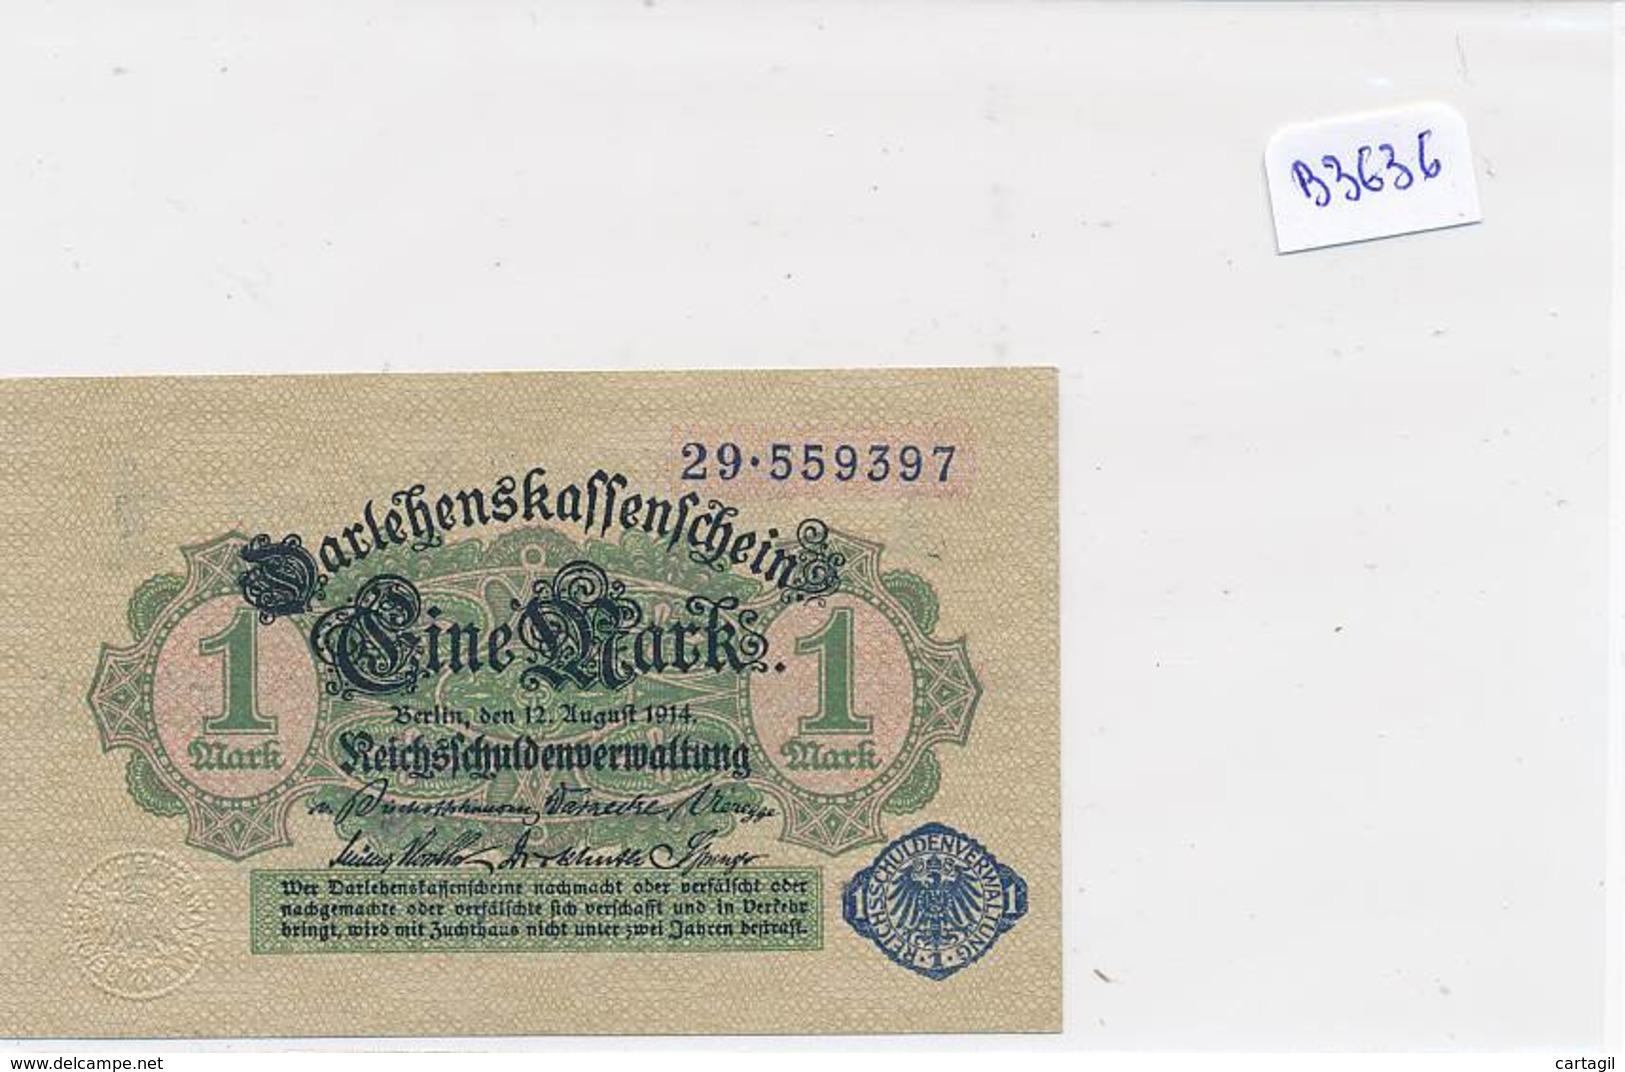 Numismatique -B3636 -Allemagne -1Mark Darlehnskassenshein 1914 ( Catégorie,  Nature état ... Scans)-Envoi Gratuit - [ 2] 1871-1918 : Impero Tedesco